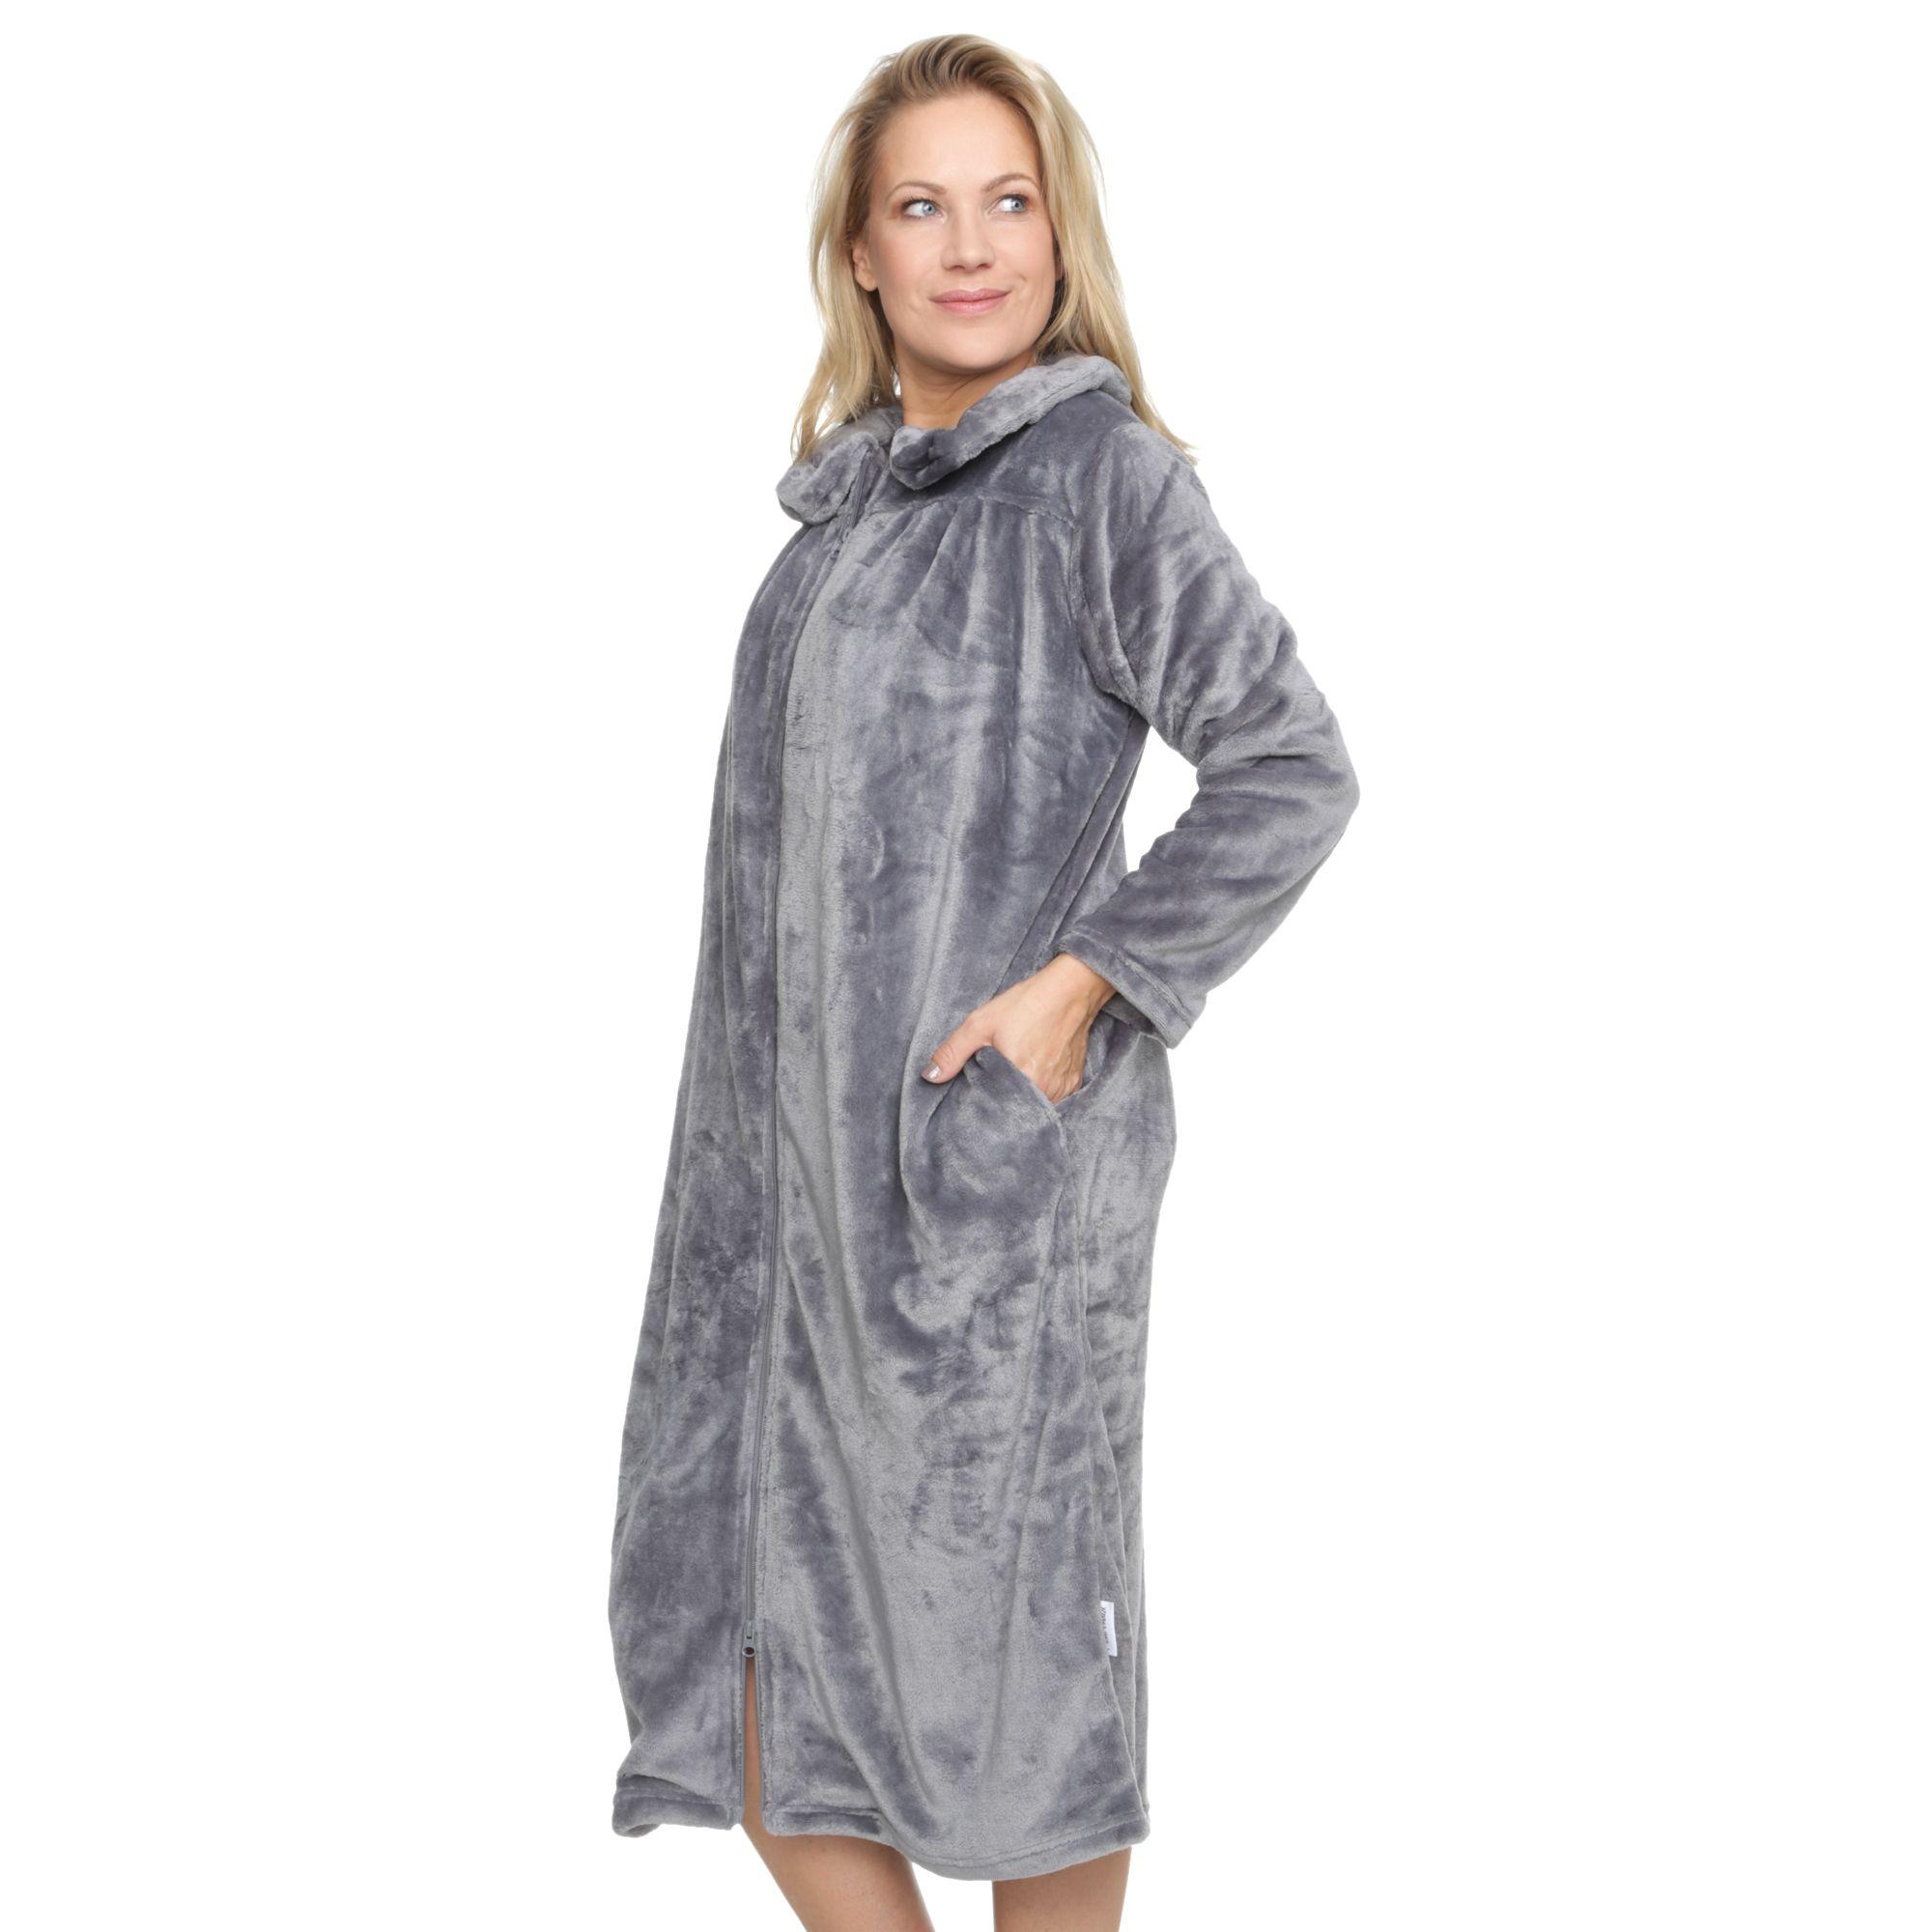 MONT CHALET Damen-Hauskleid extra lang Mikrofaser ...